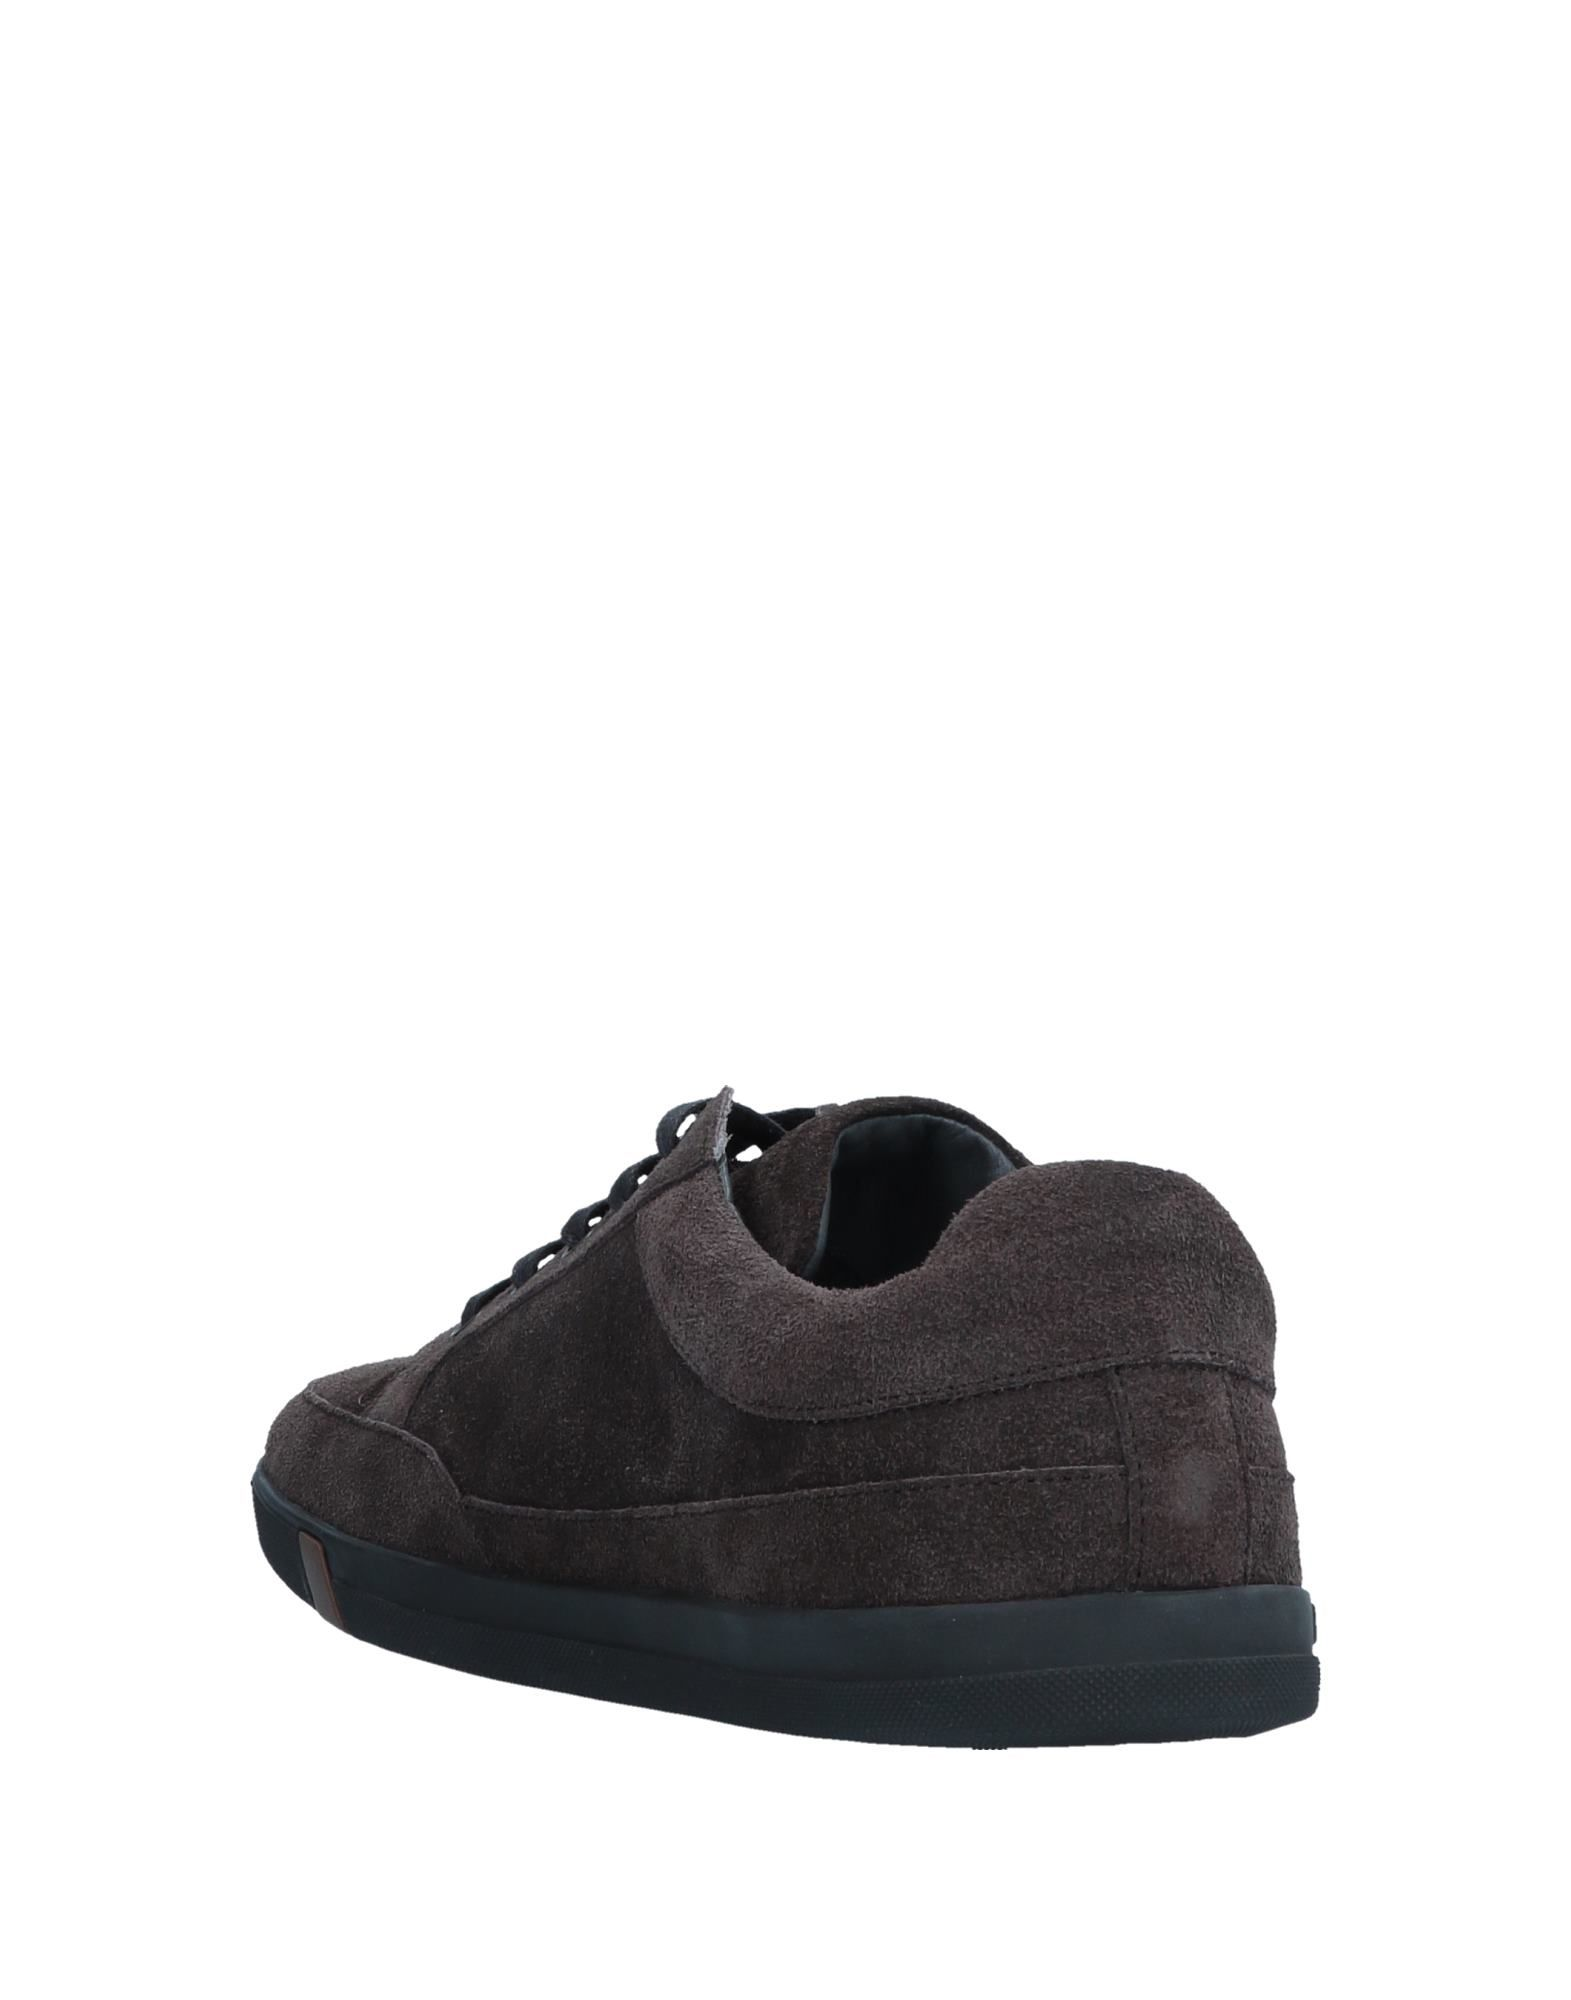 Armani Jeans Sneakers Herren  Schuhe 11552700PD Gute Qualität beliebte Schuhe  b6229c